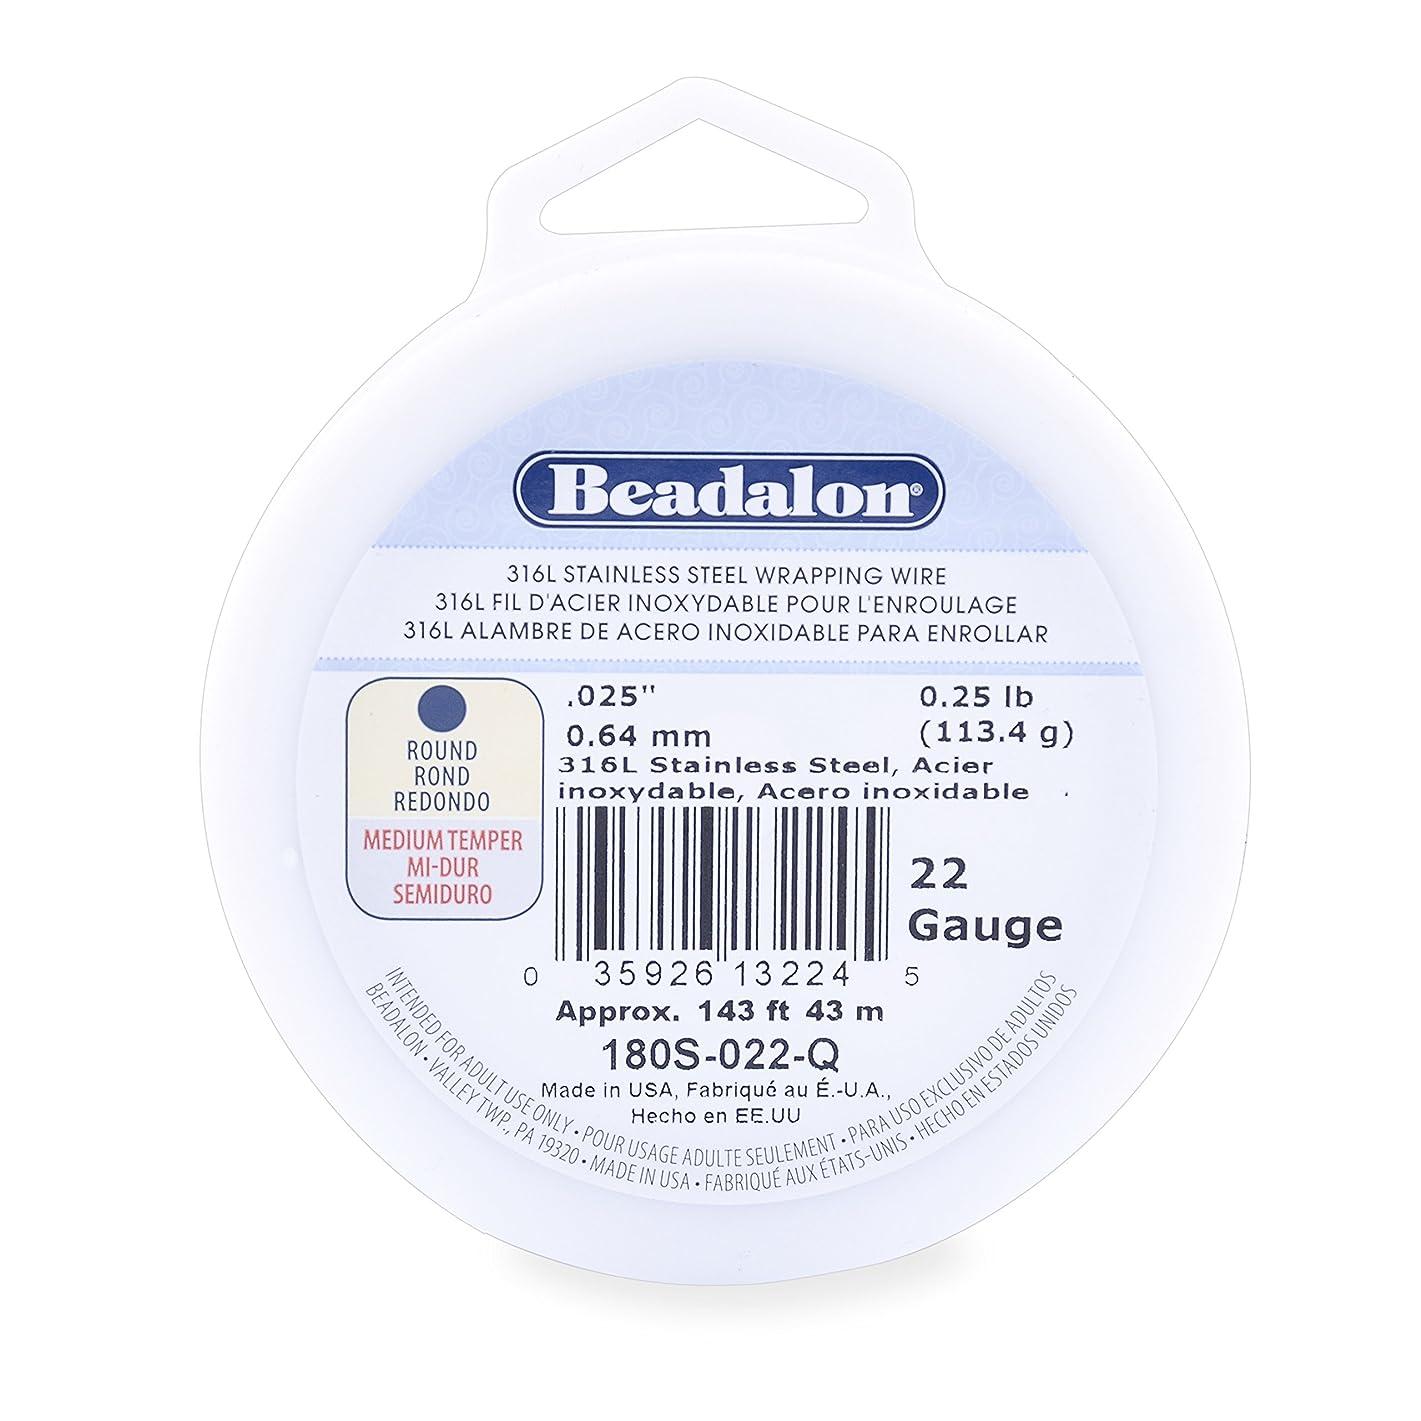 Beadalon 316L Stainless Steel Wrapping Wire, Round, 22 Gauge, Round, 143 feet, 1/4 Pound